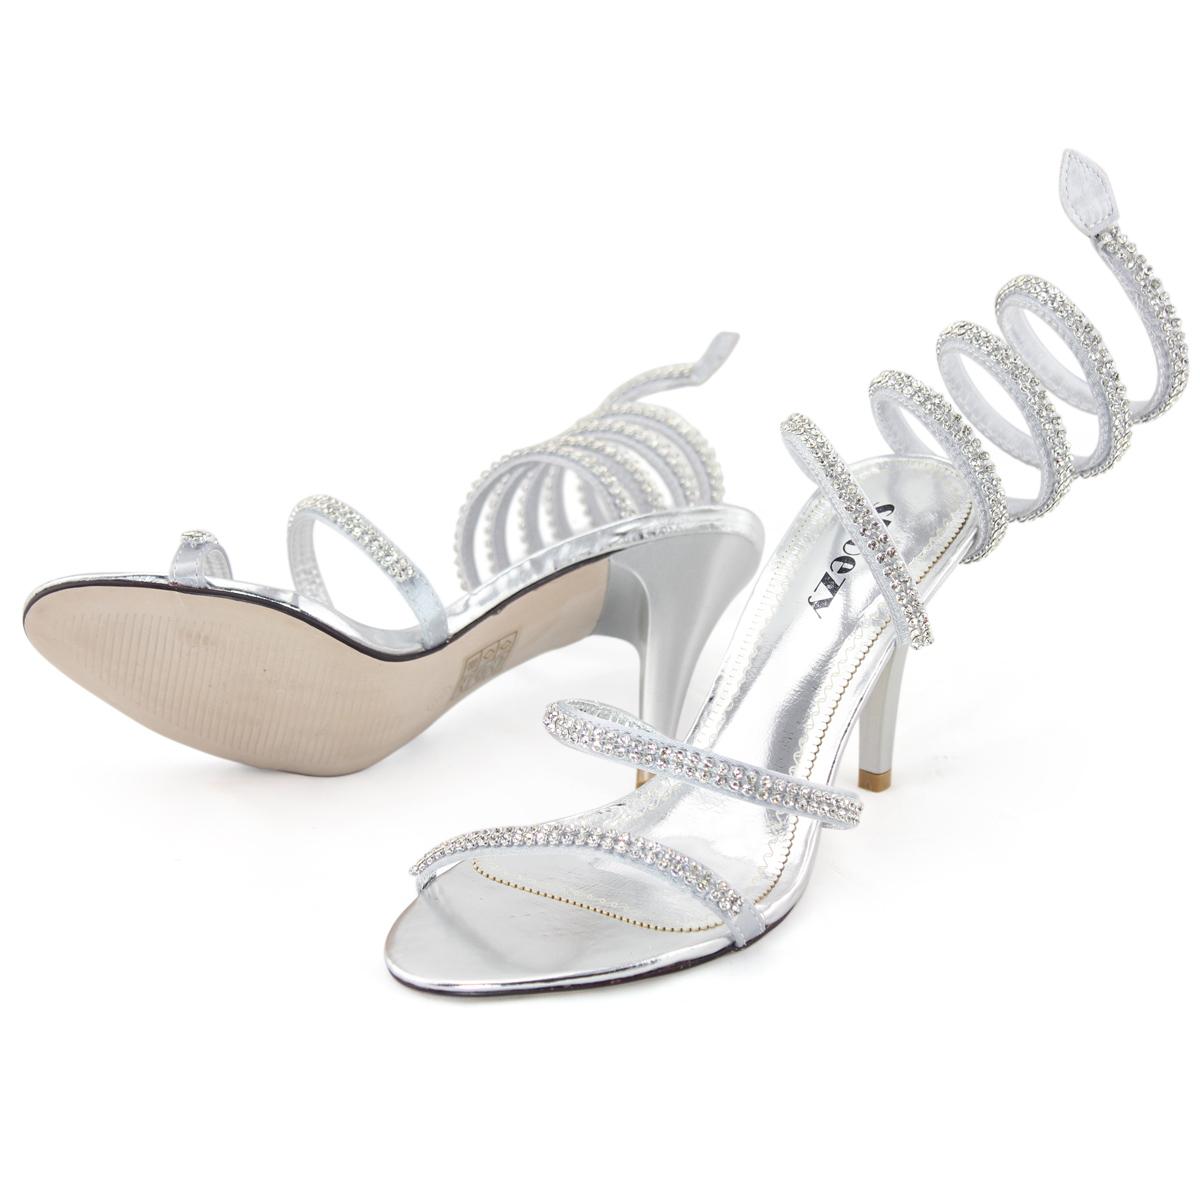 SHOEZY womens silver strappy diamante formal wedding prom ...